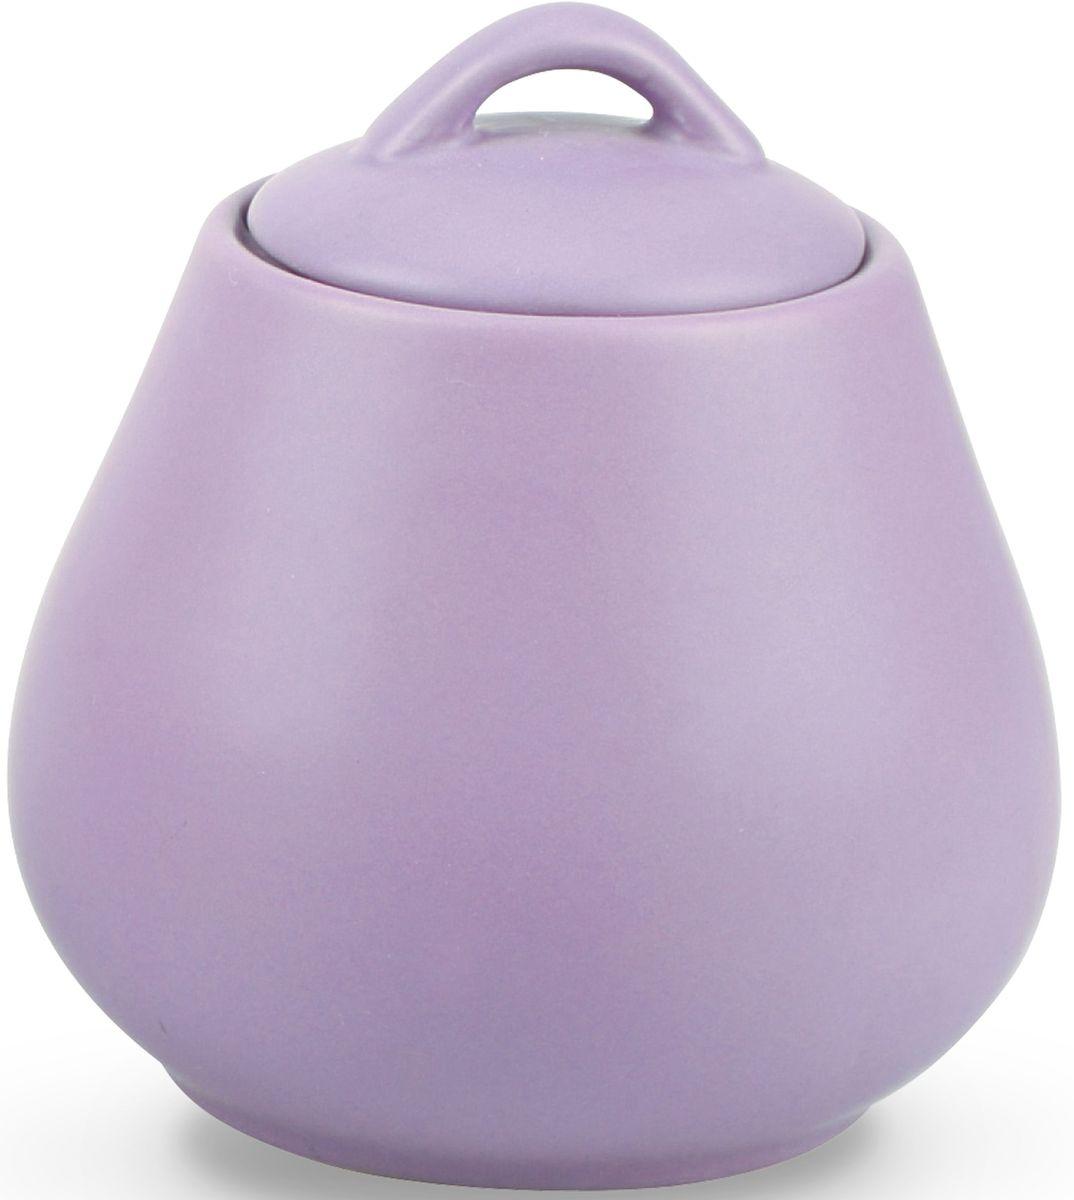 Сахарница Fissman, цвет: лиловый, 600 мл. 9328SB-9328.600